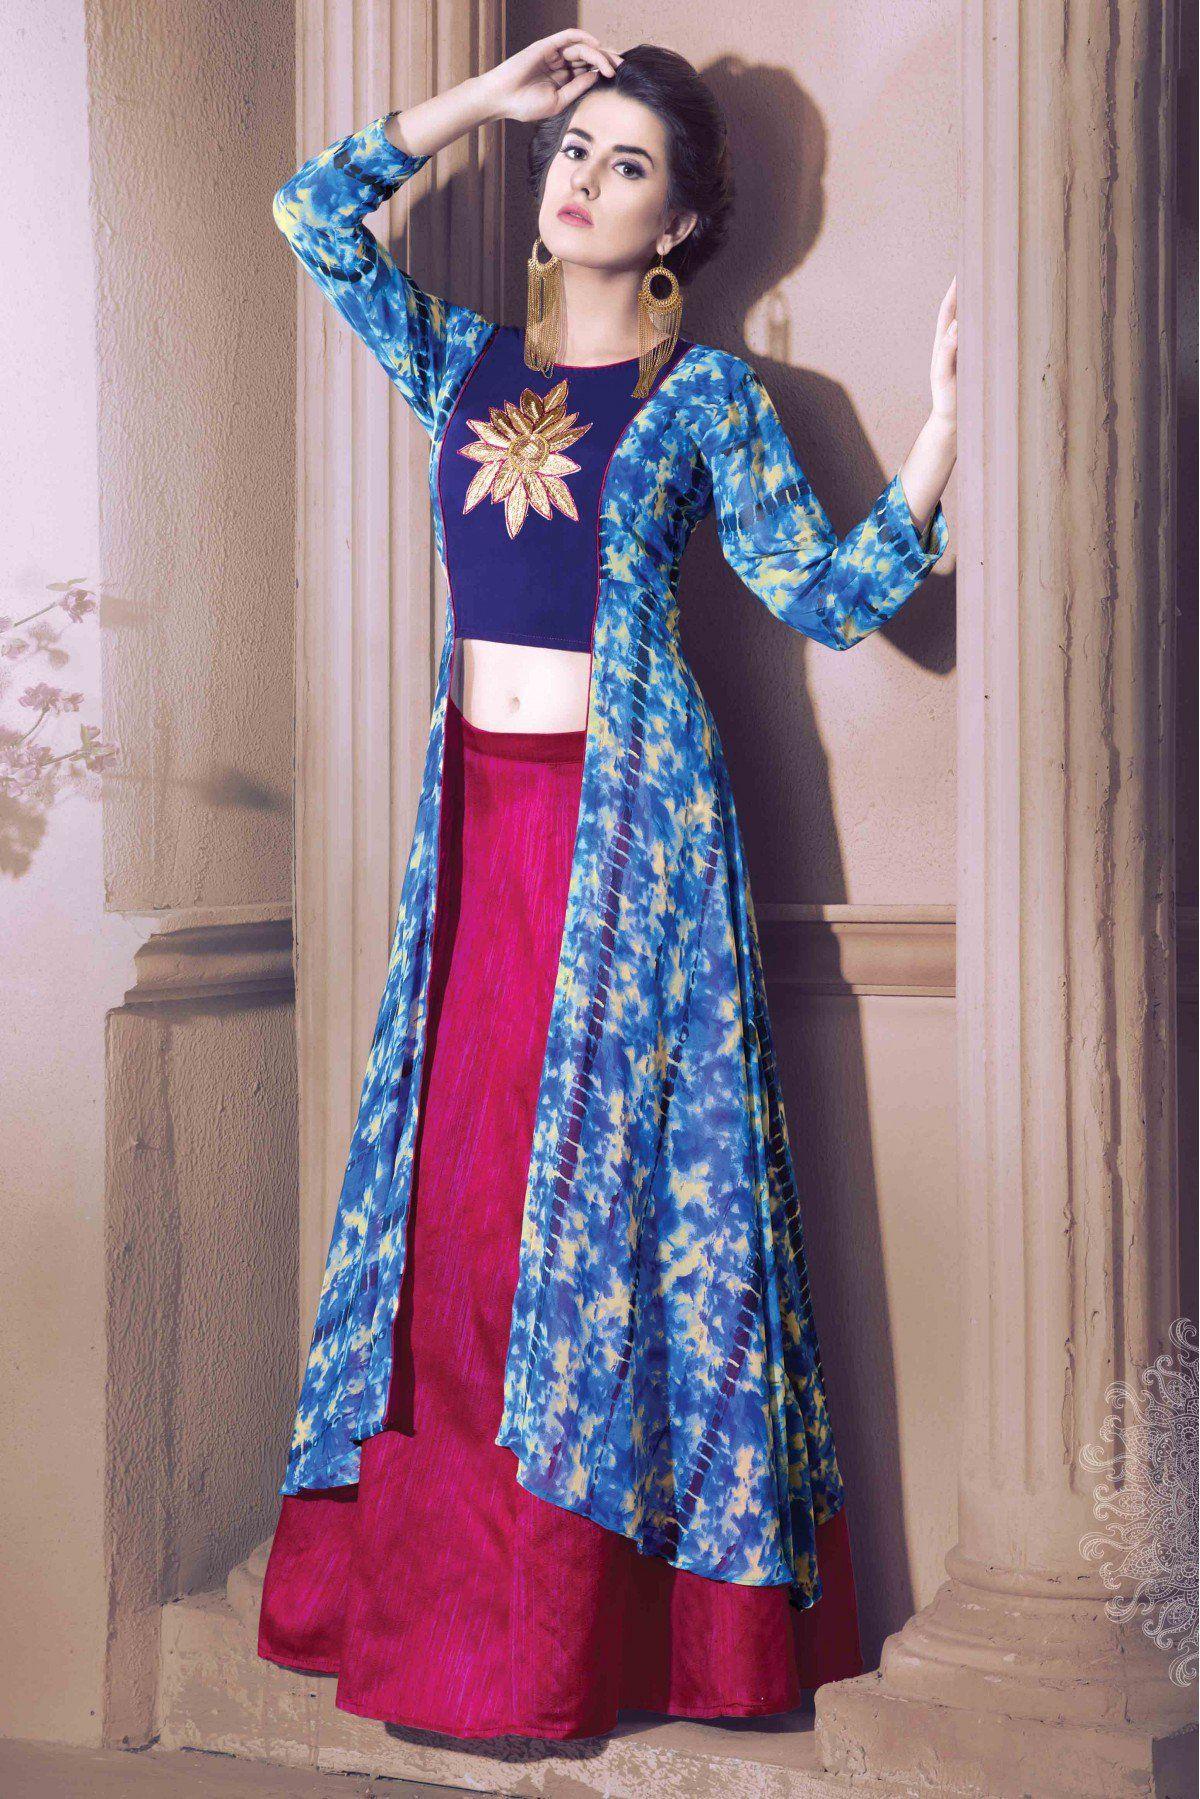 72e93a1fb1 Girls Kurti, Indian Tunic Tops, Designer Kurtis Online, Churidar, Anarkali,  Lehenga